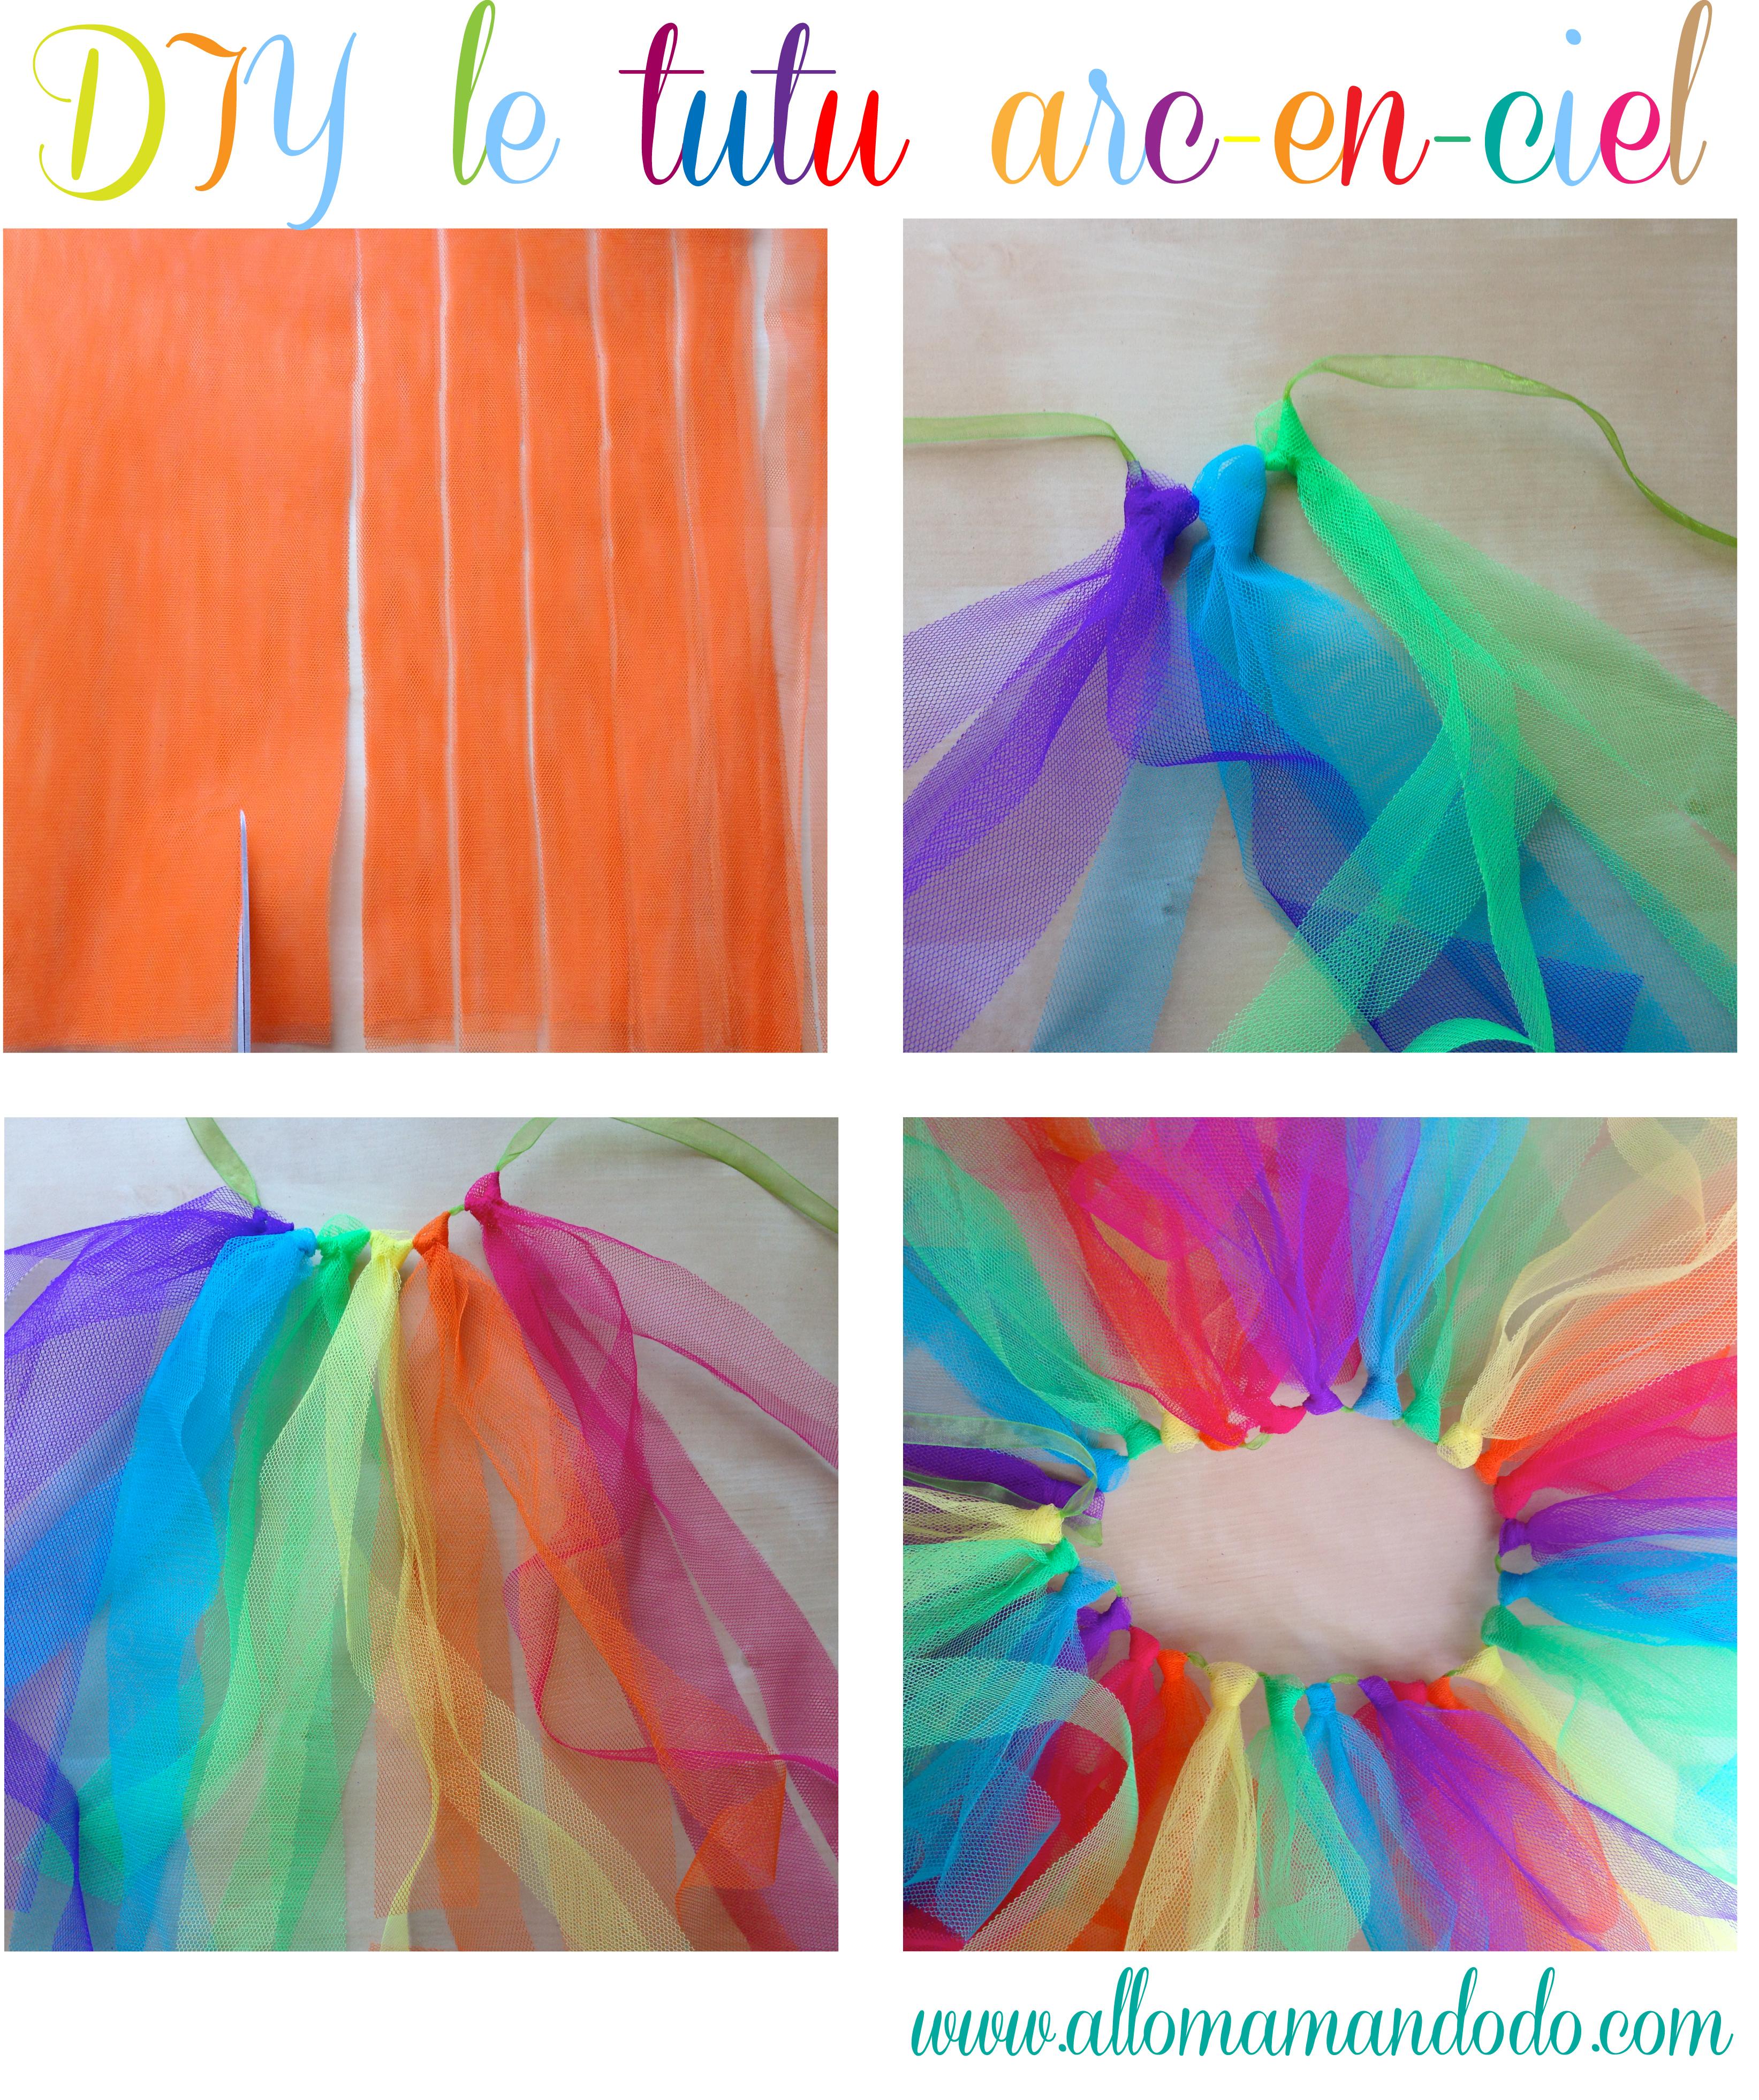 Diy le tutu arc en ciel de sa rainbow party allo maman dodo - Faire un tutu pour adulte ...